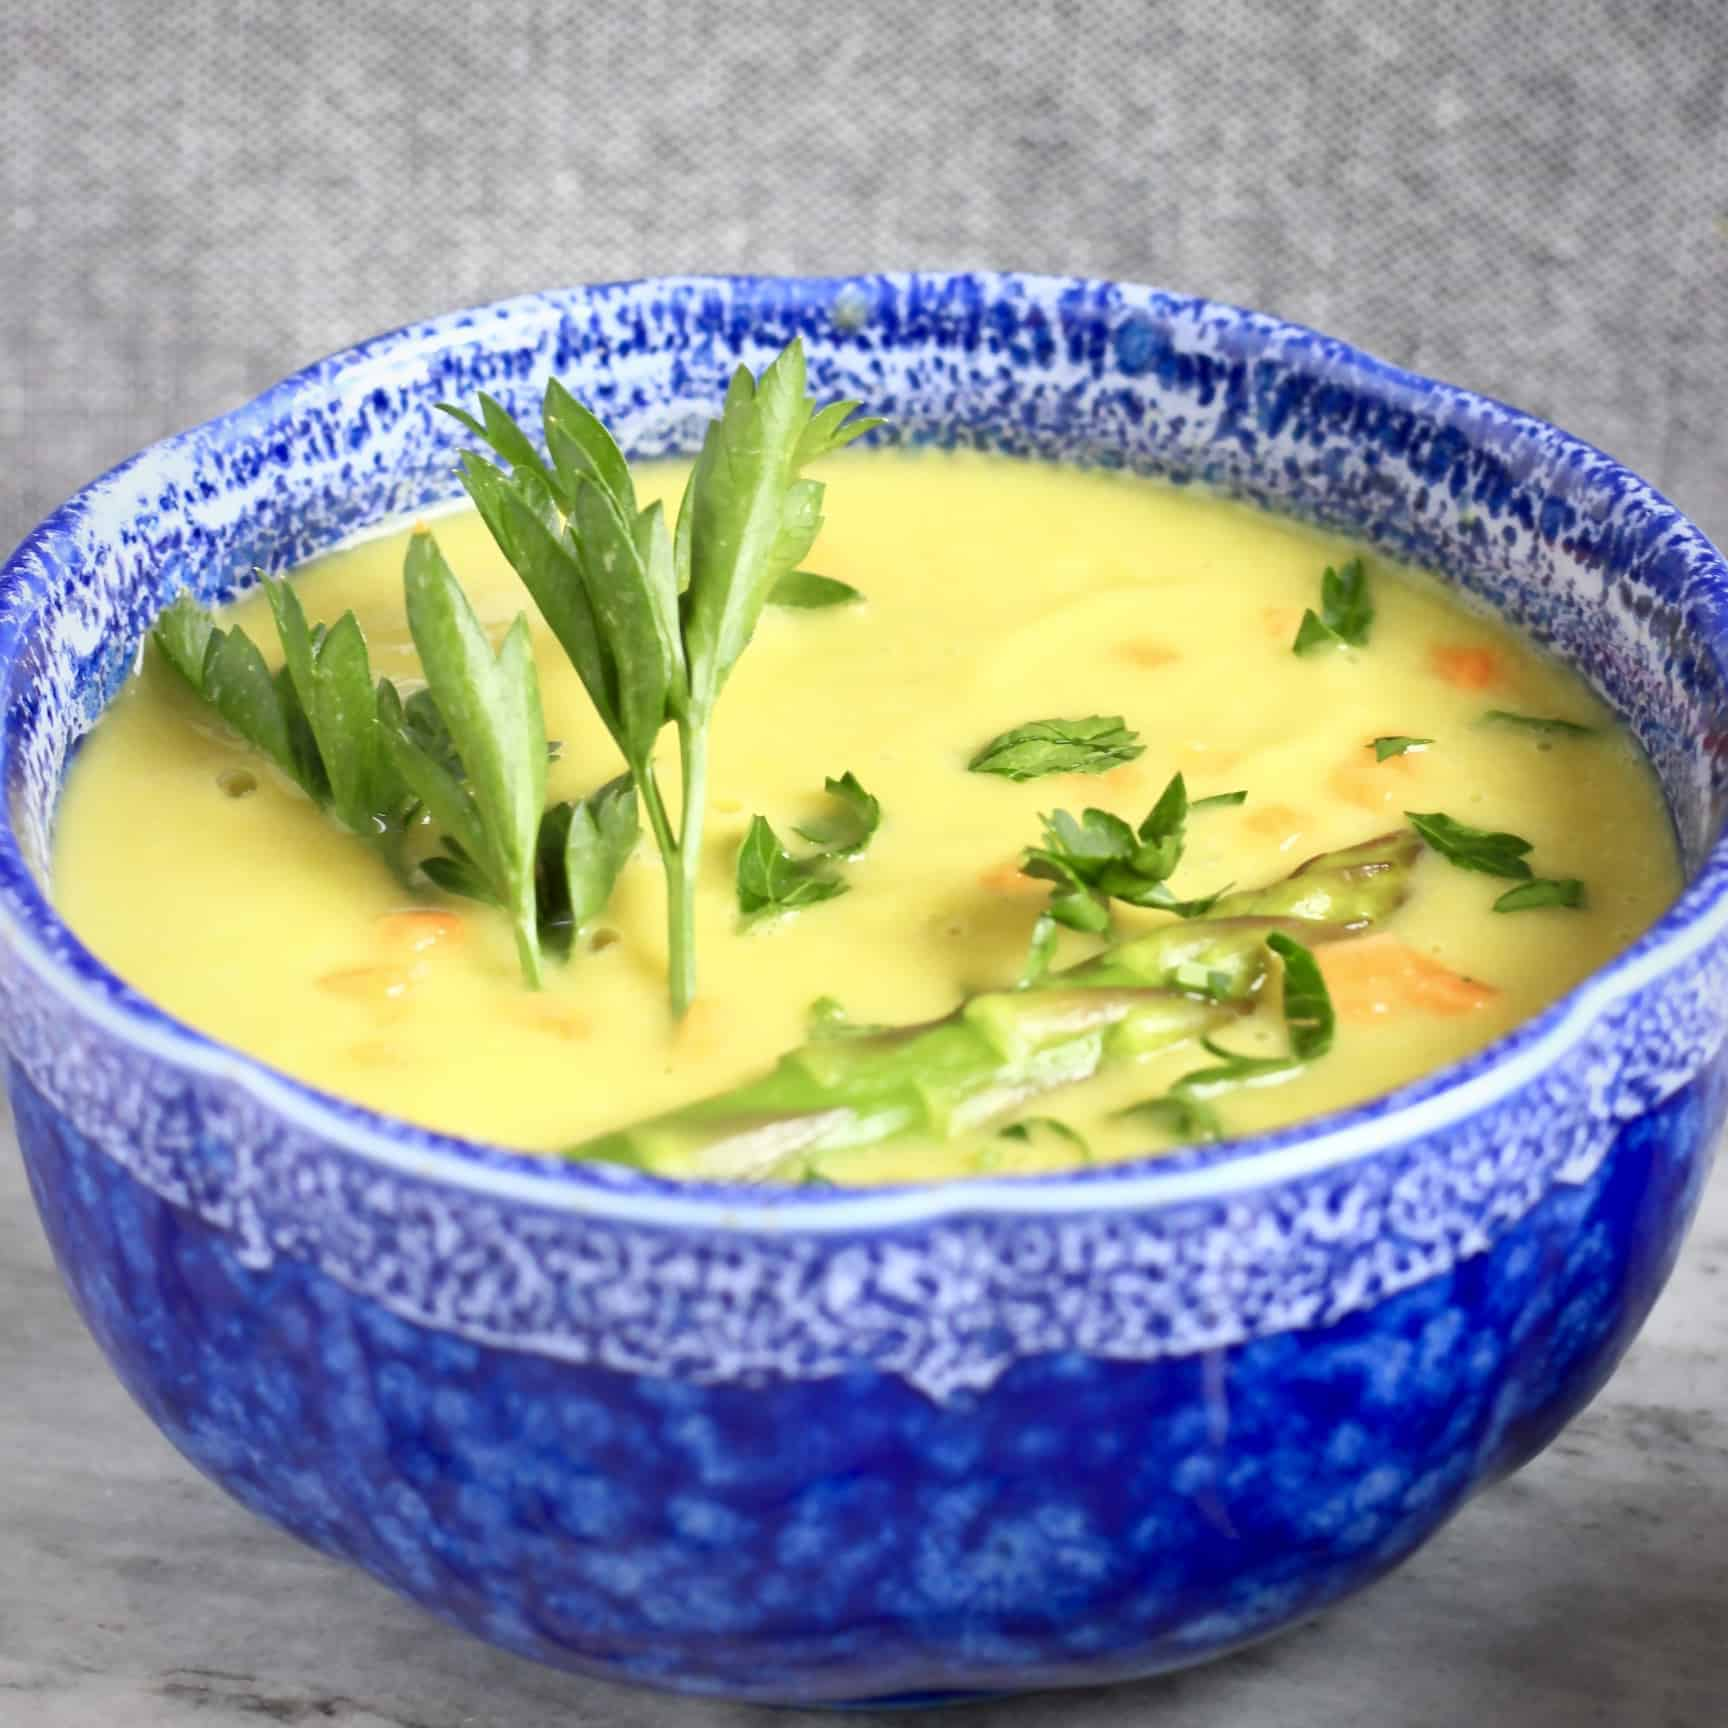 Vegan Cream of Asparagus Soup (GF)